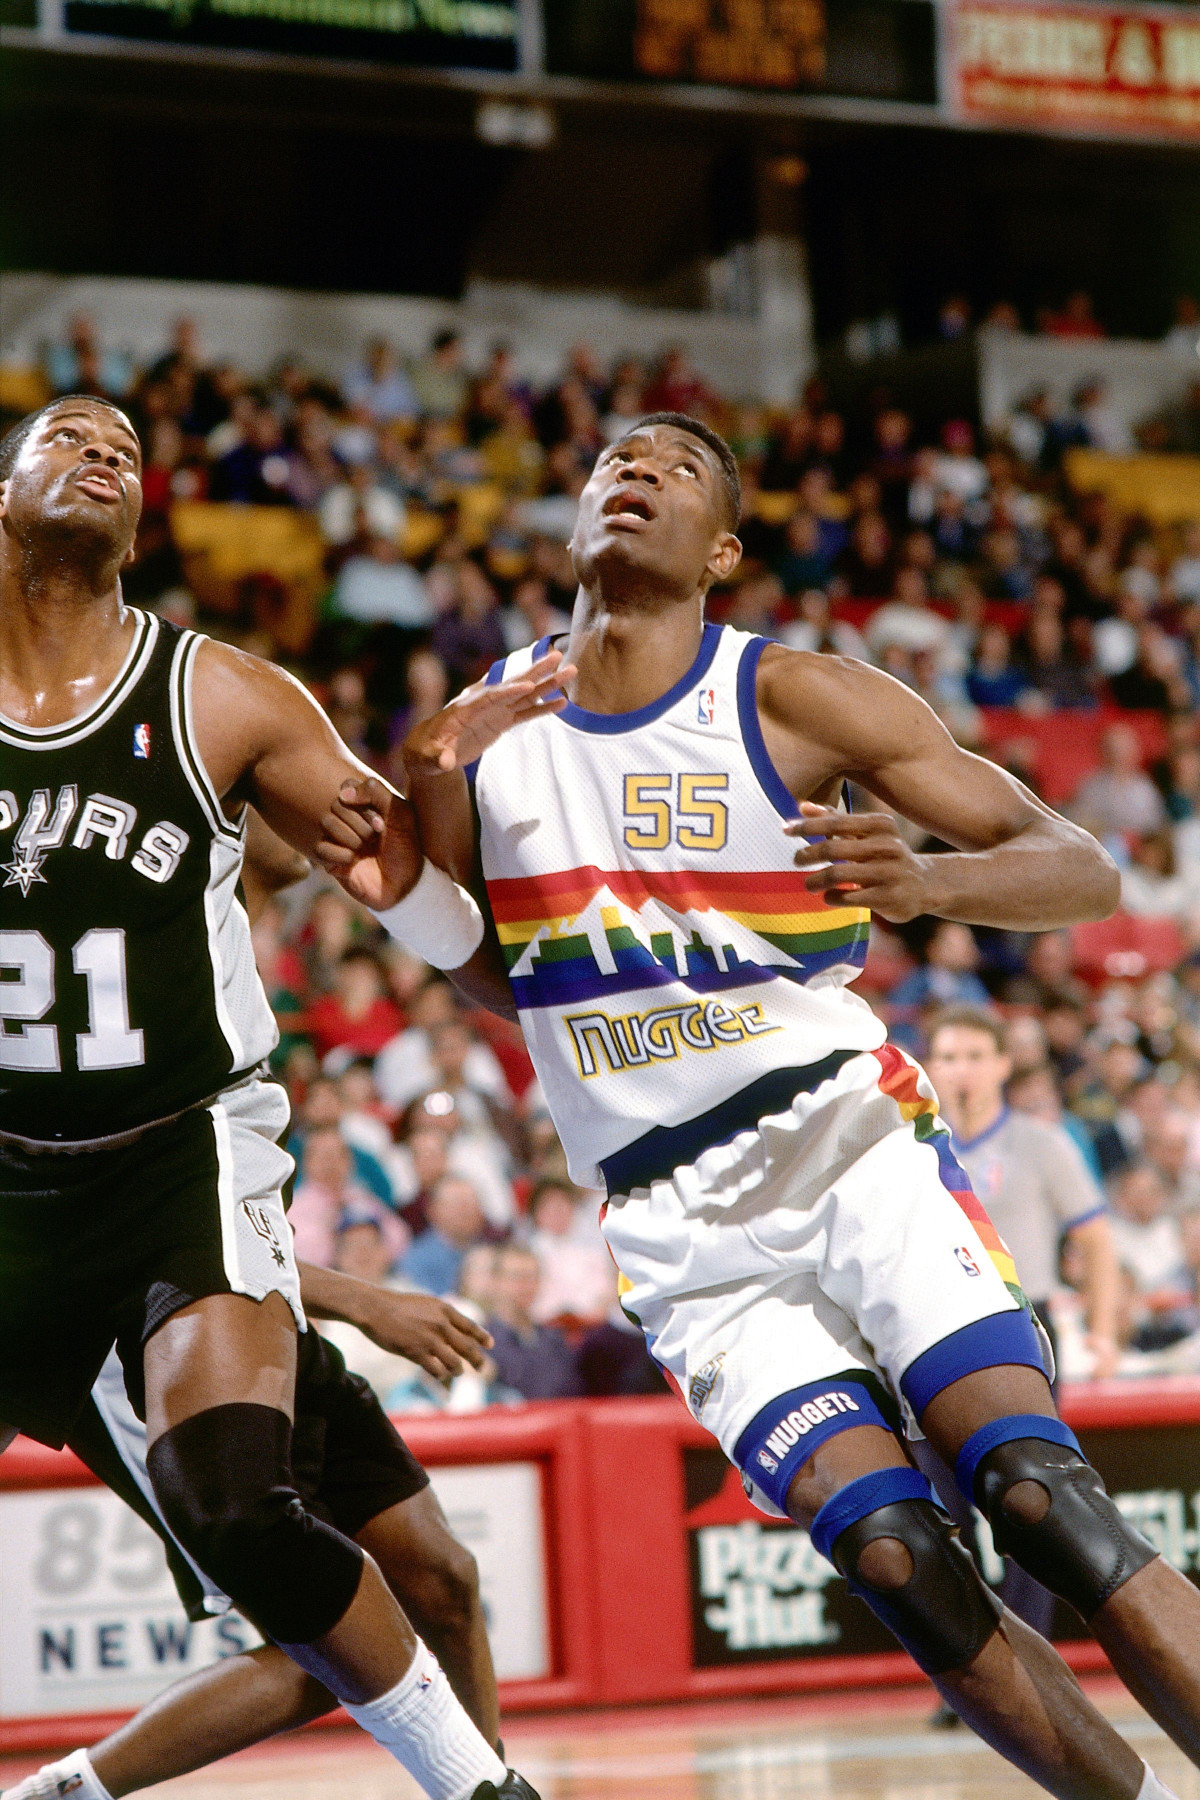 Denver Nuggets 1991 jersey Dikembe Mutombo